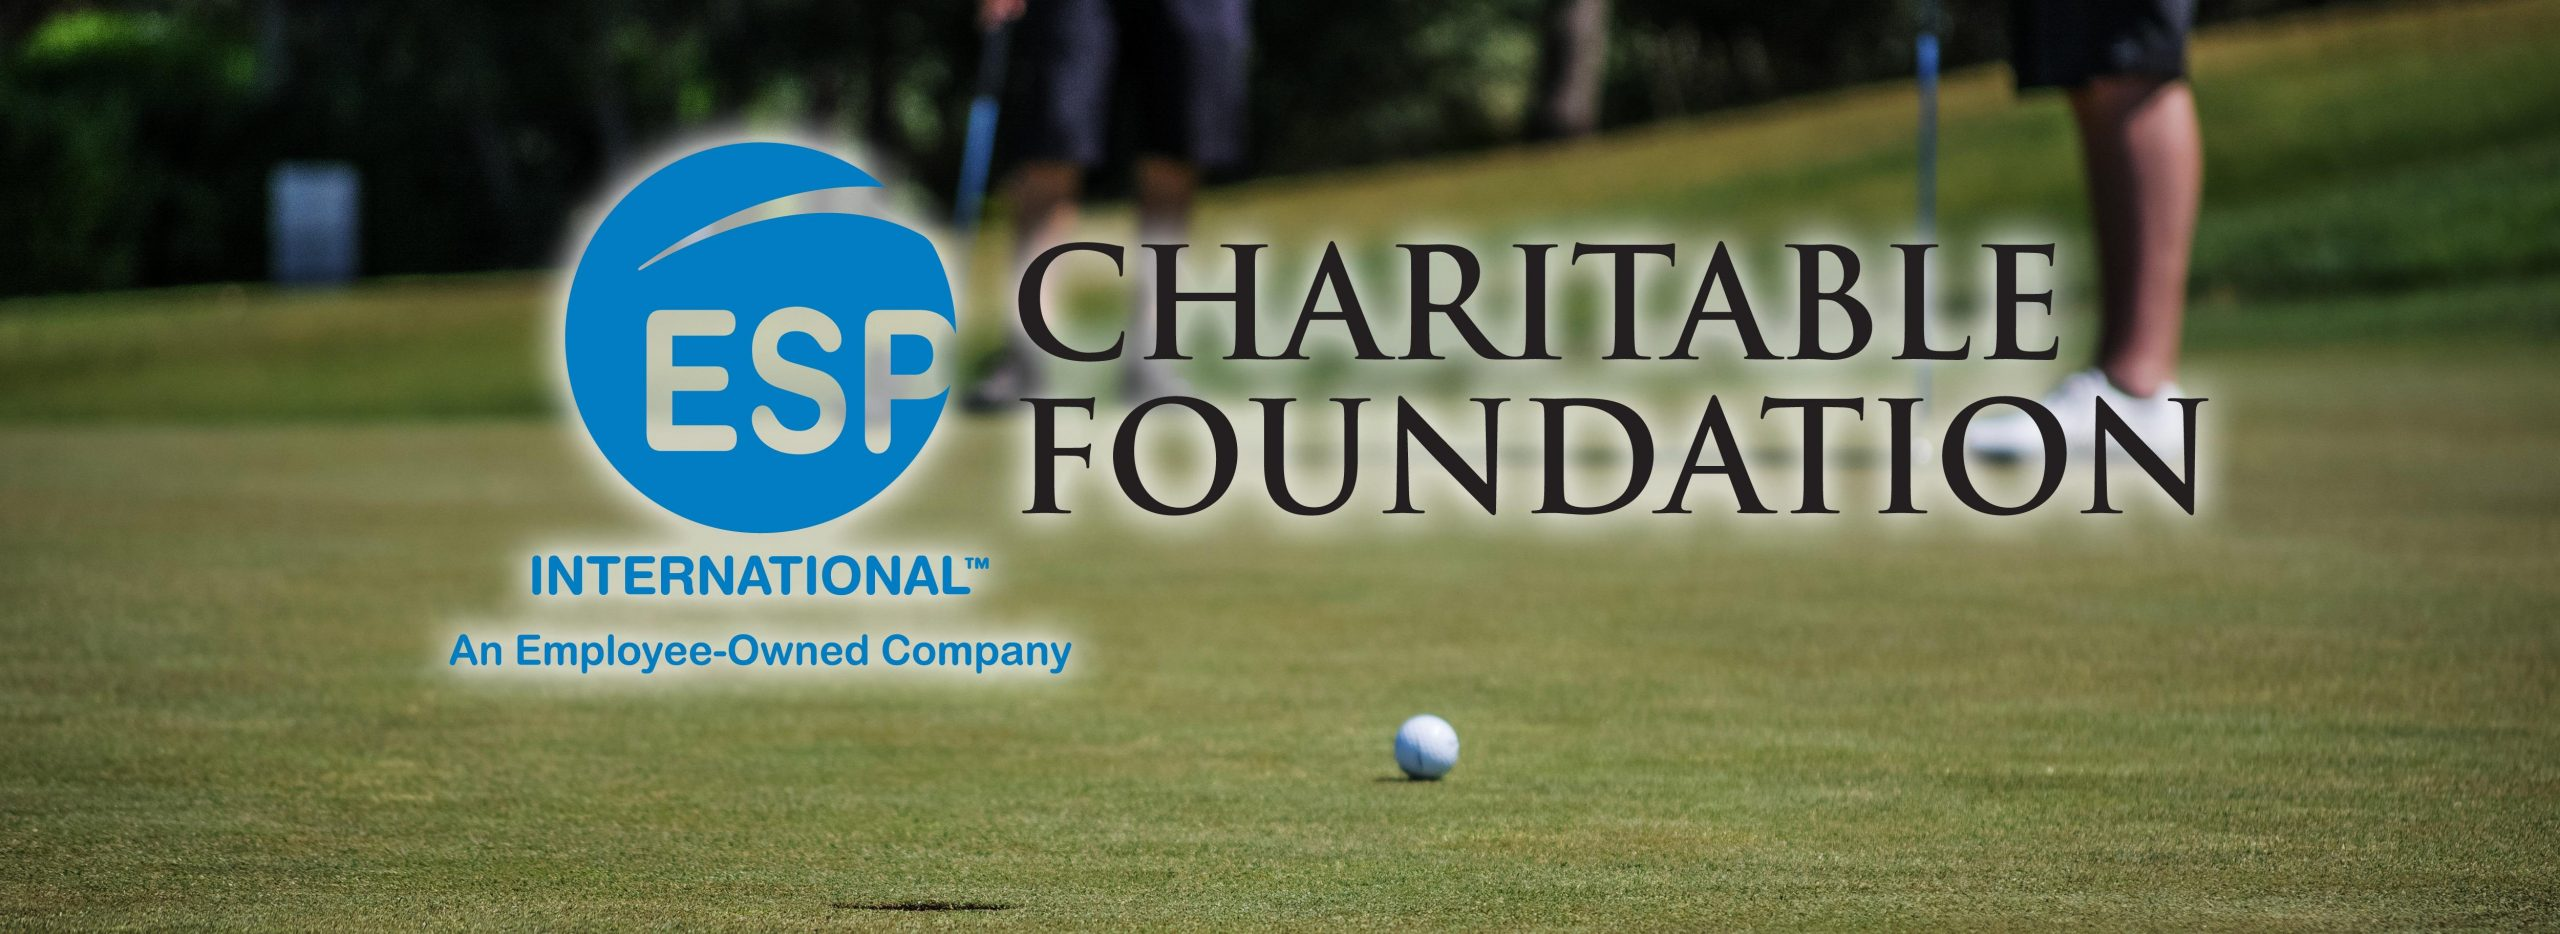 2021 Annual Golf Fundraiser